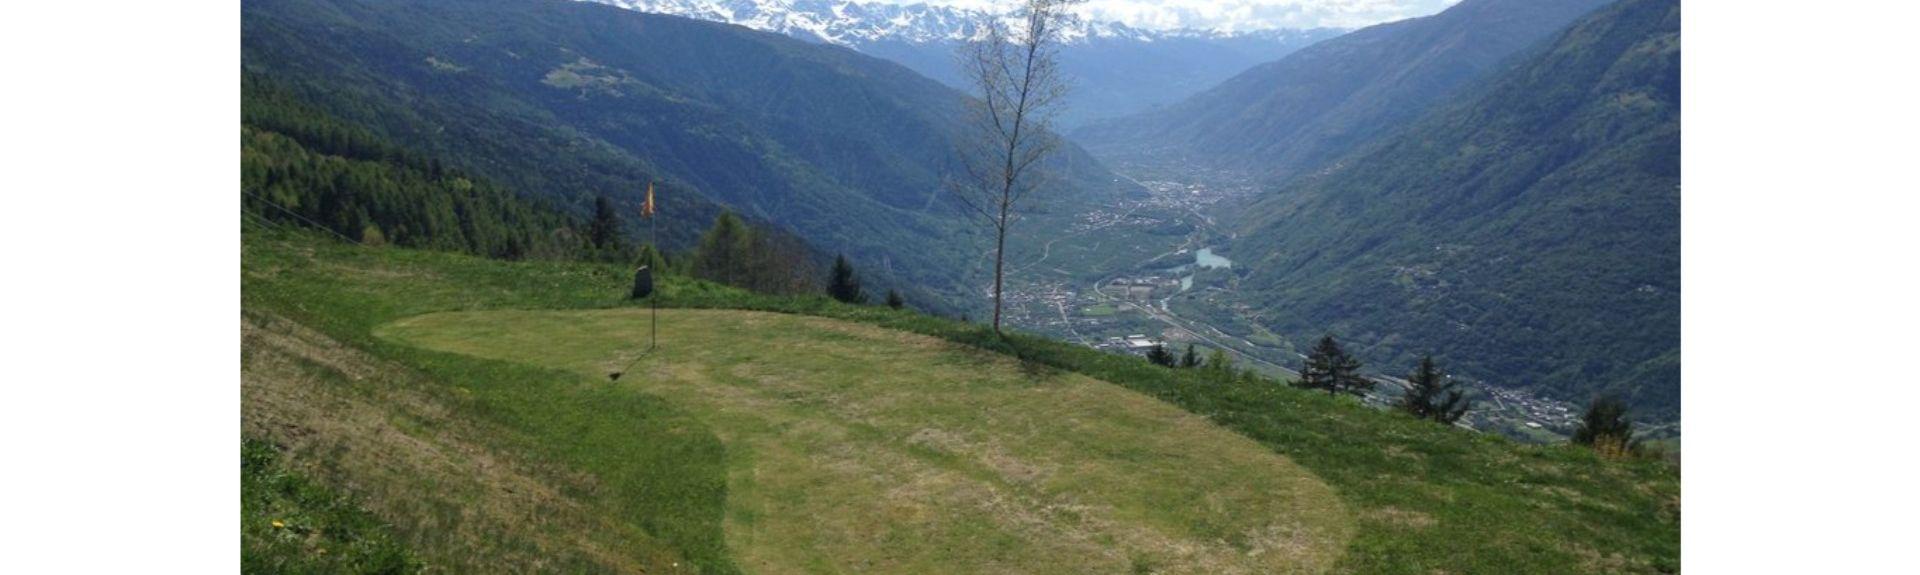 Temu, Lombardia, Italia